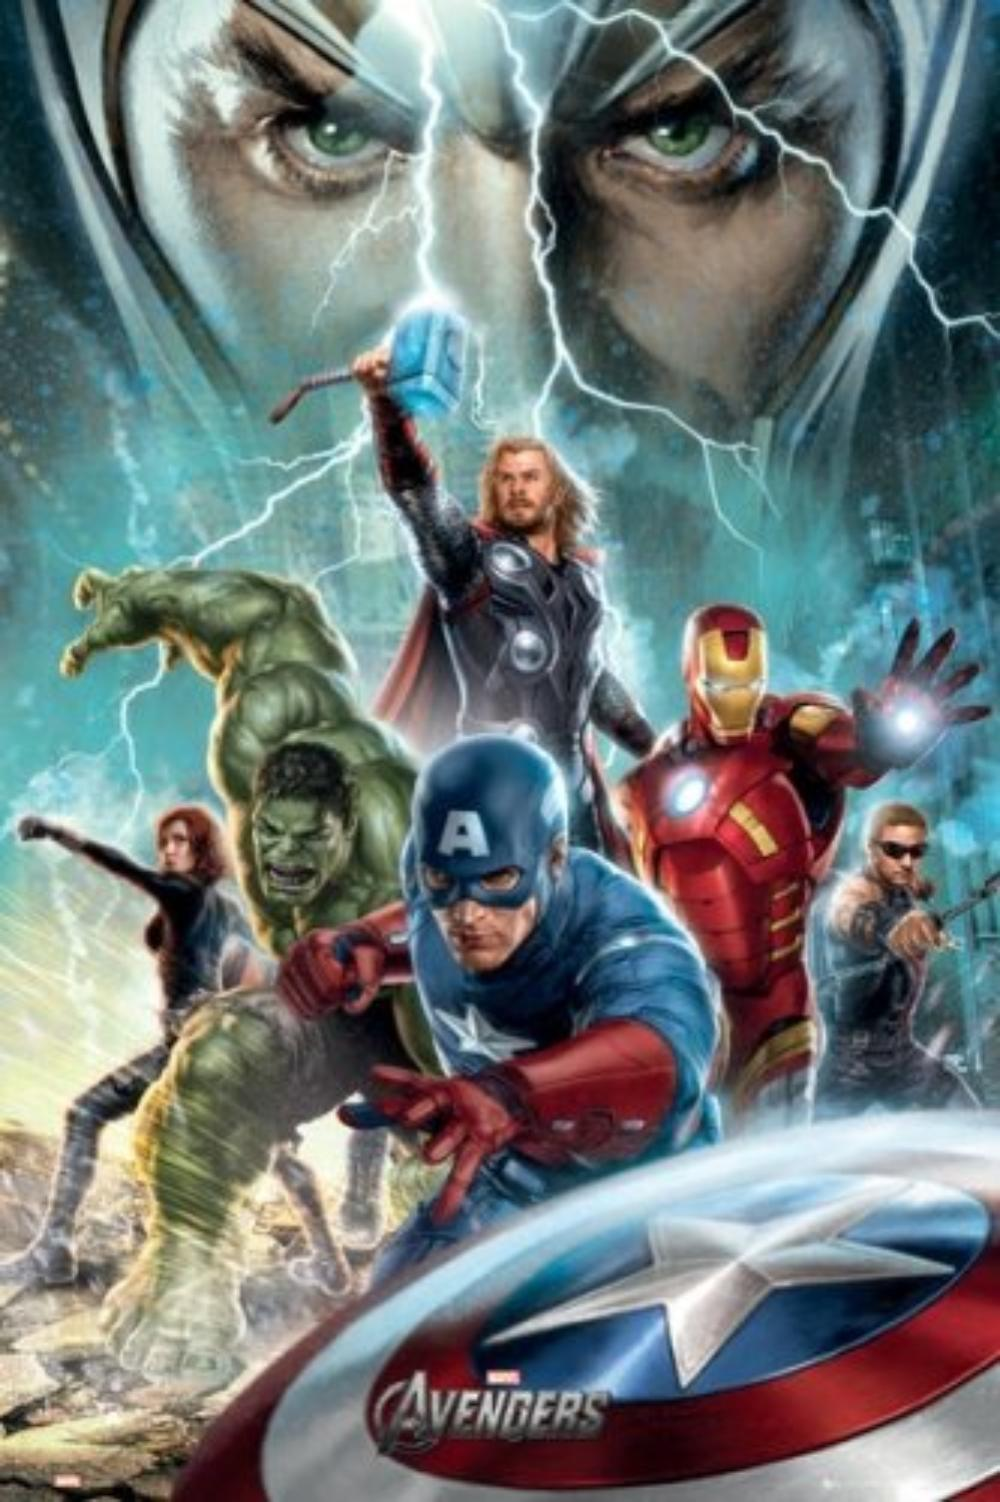 1 x the avengers movie poster power iron man captain america thor hulk hawk black widow loki size 24 x 36 by poster stop online usa